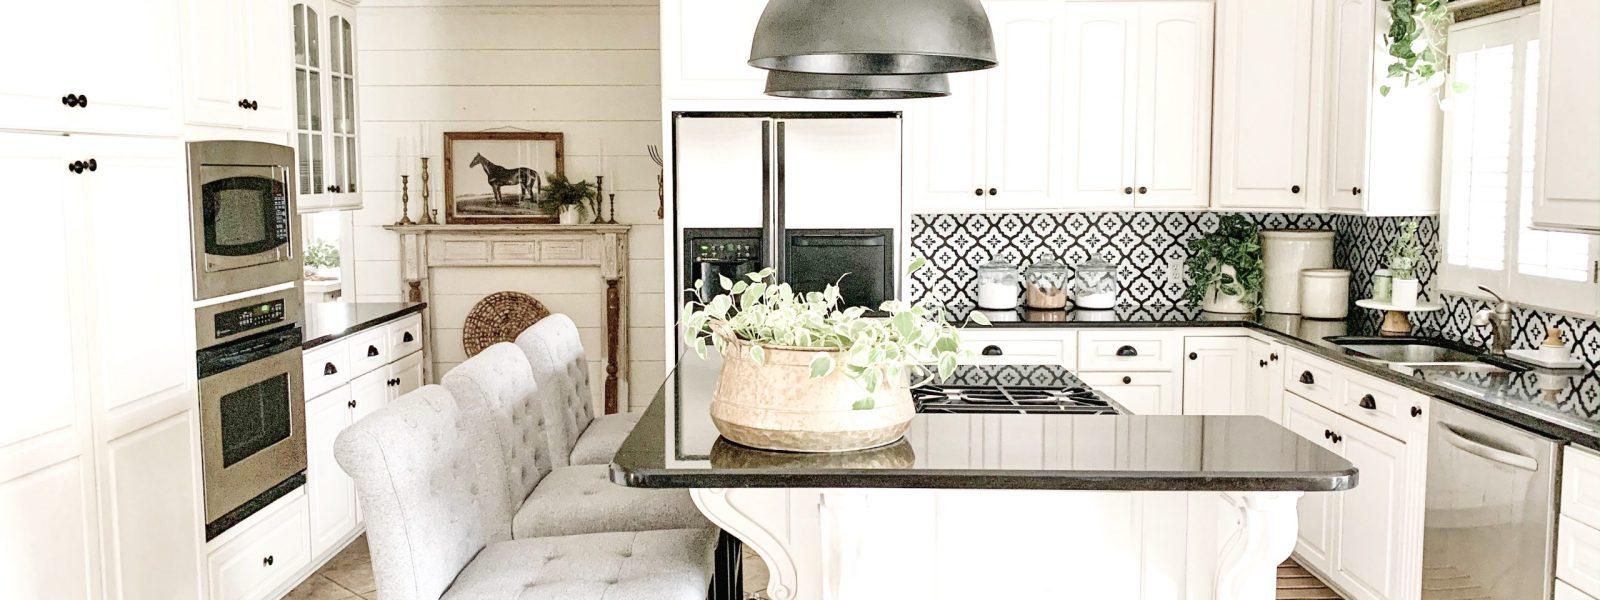 Kitchen Refresh Reveal- 3 Simple Ways to Refresh Your Kitchen